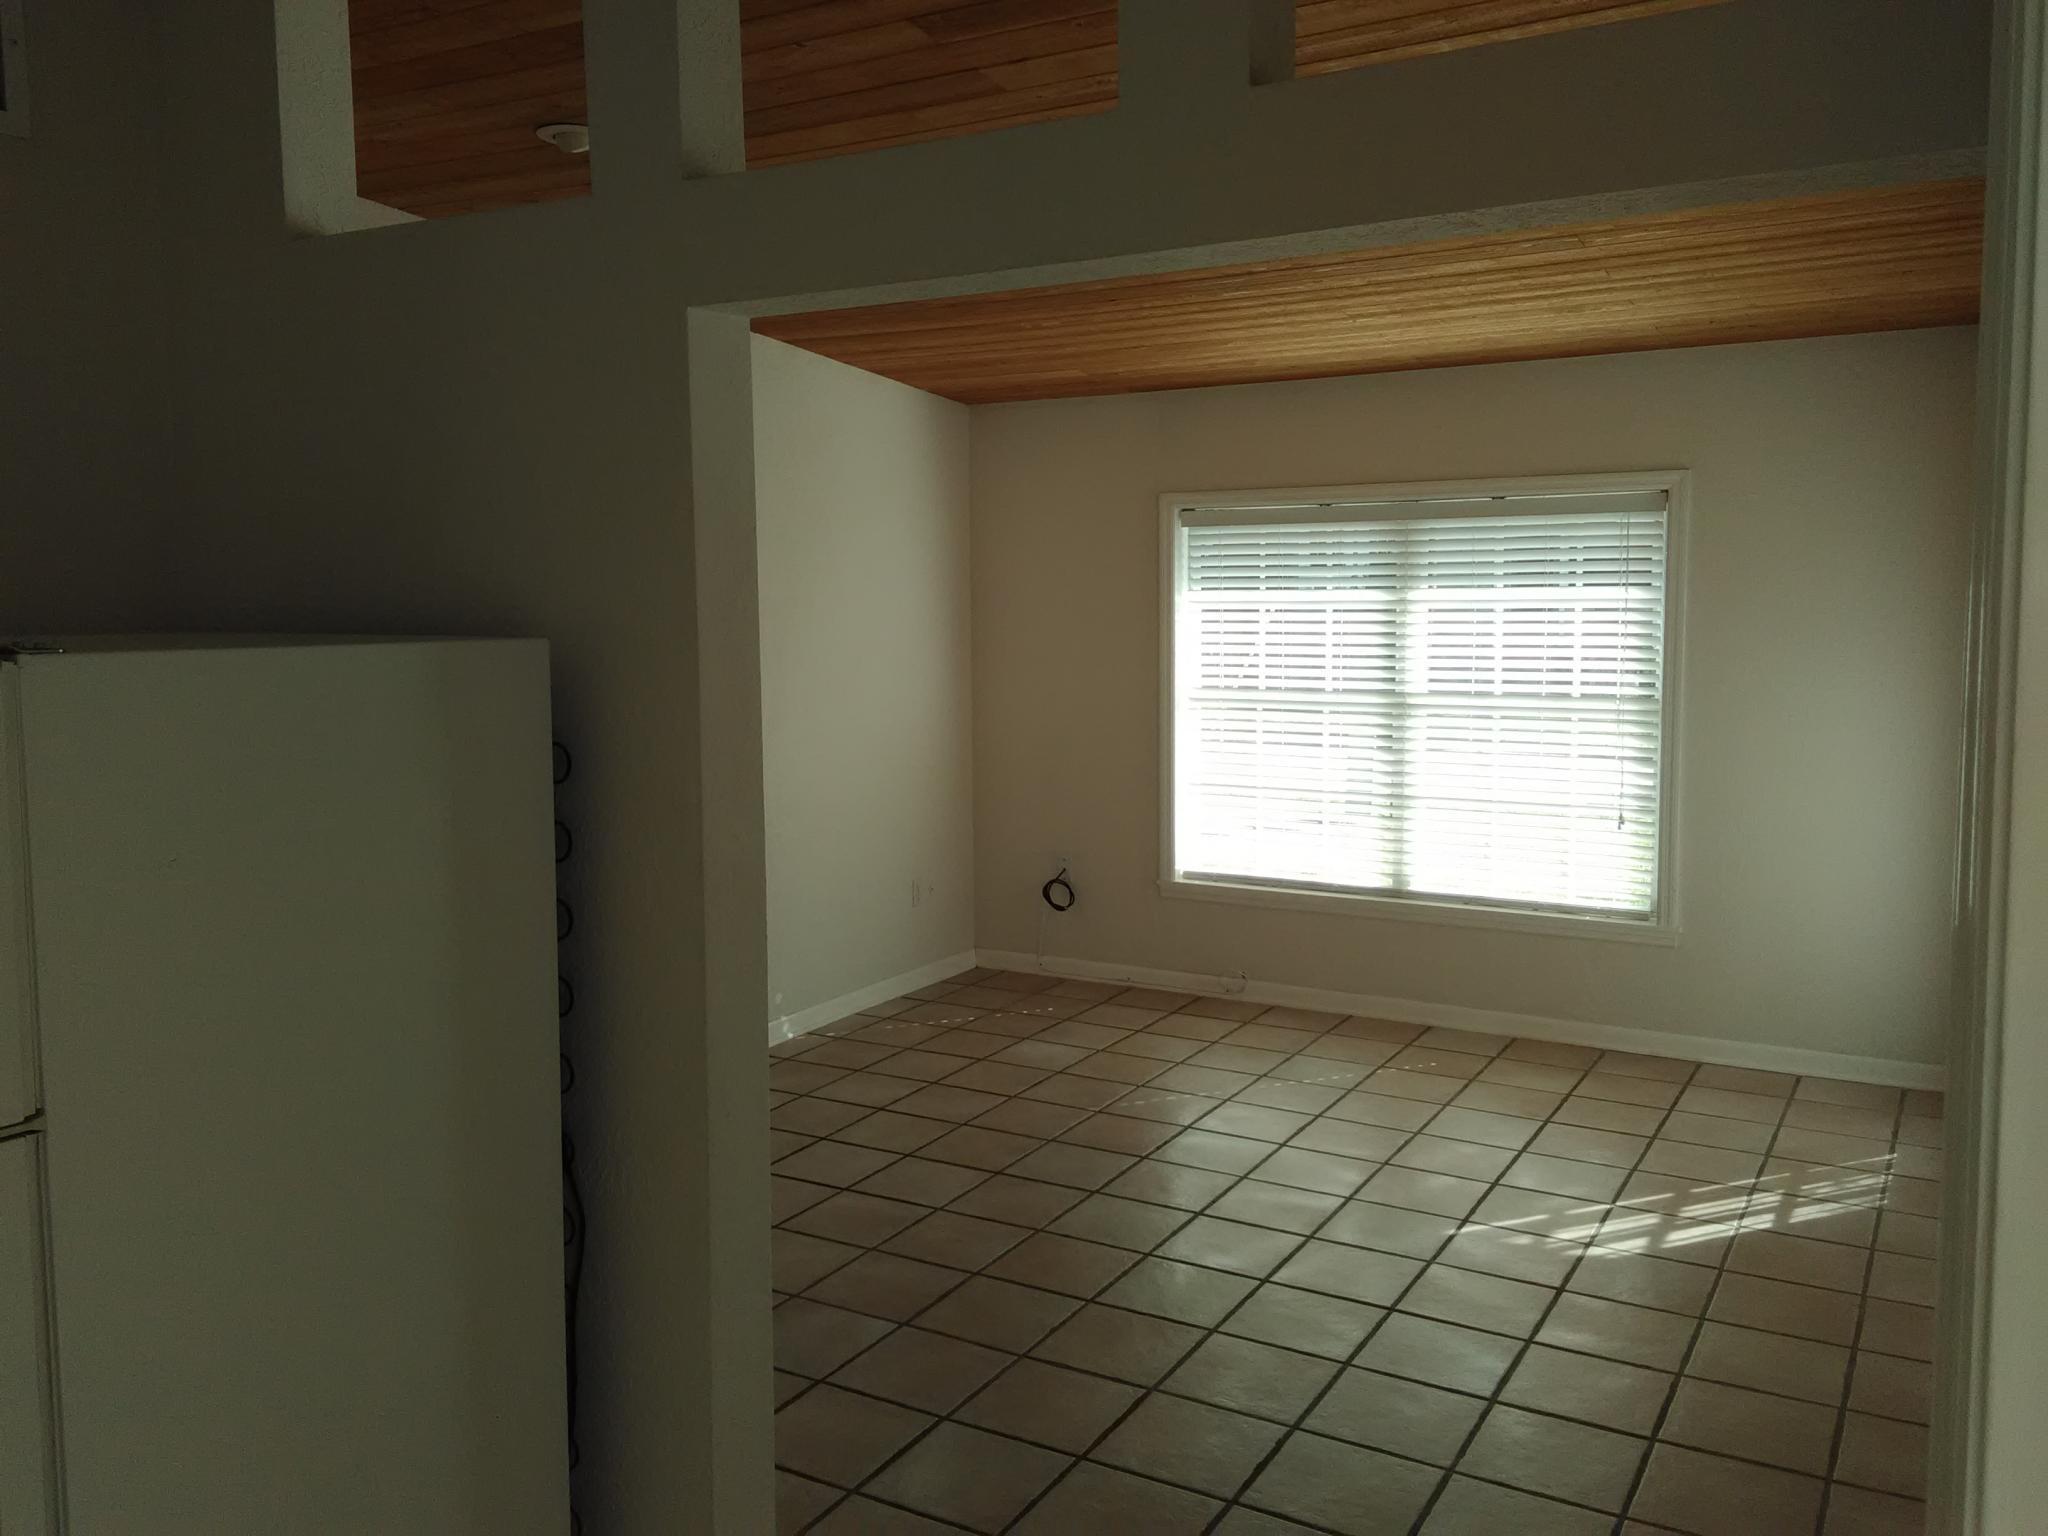 1011 Washington Ave, Winter Park, FL 32789 For Rent   Trulia